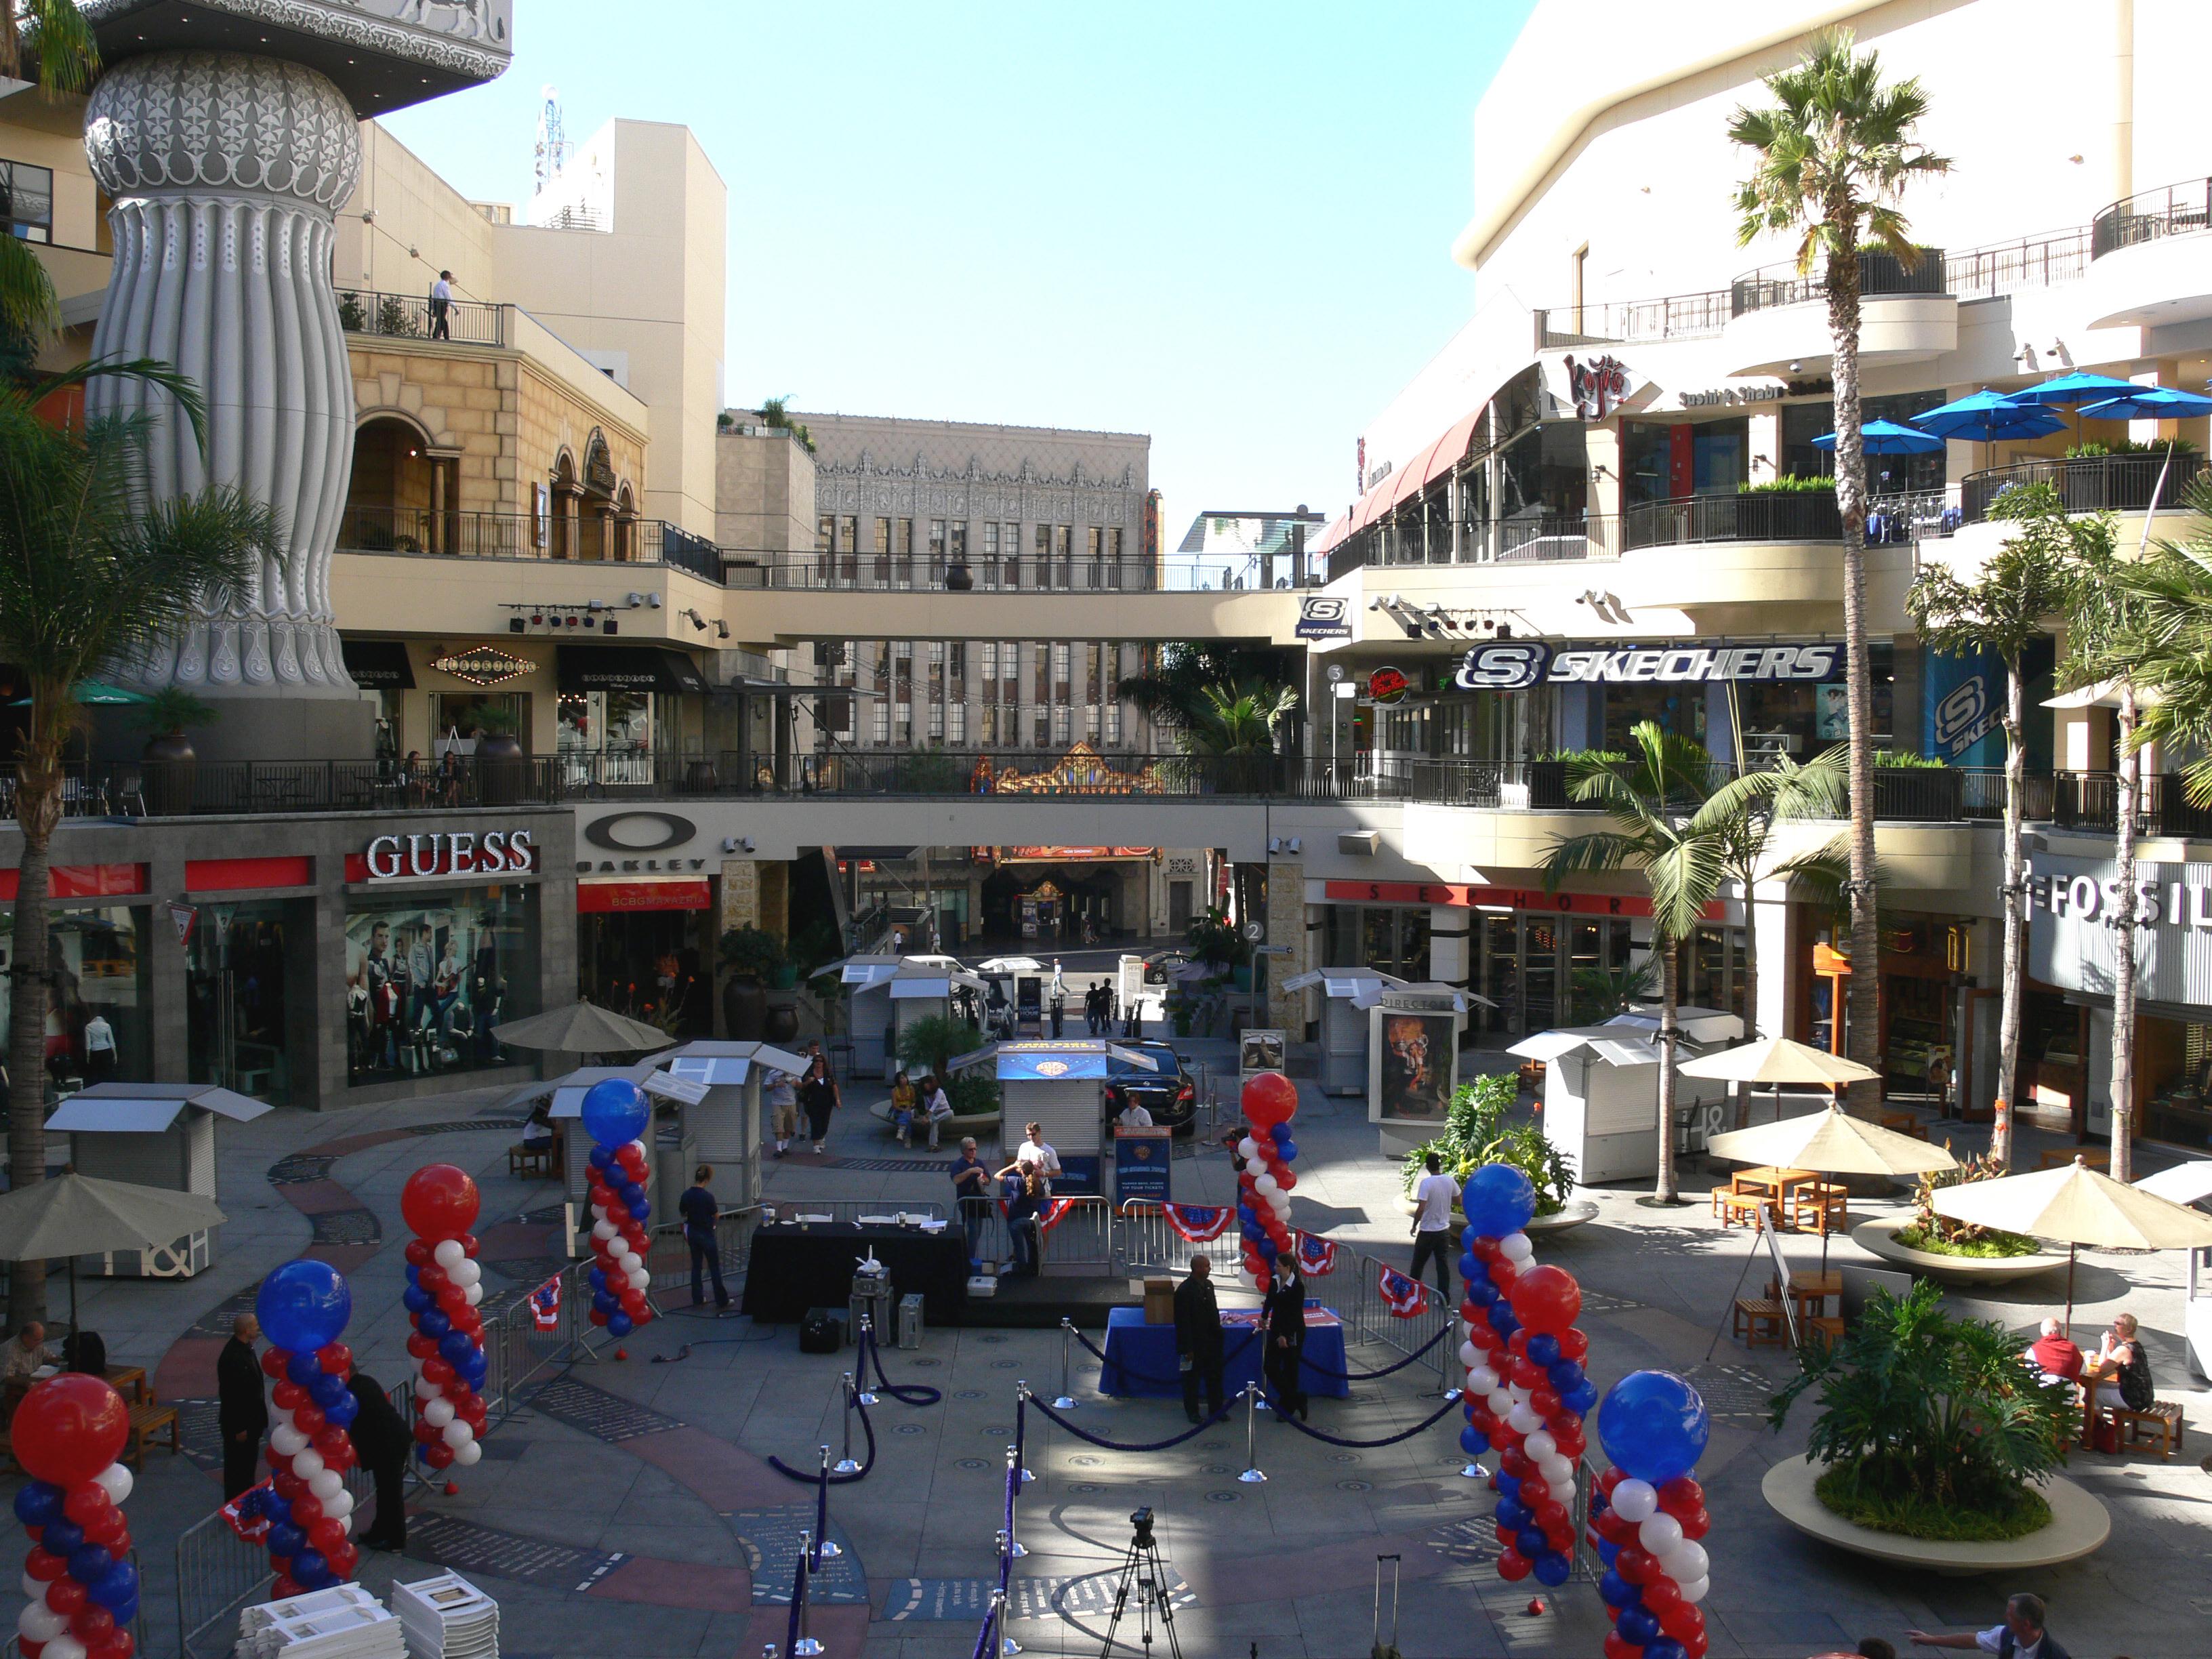 Hollywood_Kodak_Theatre_mall_2